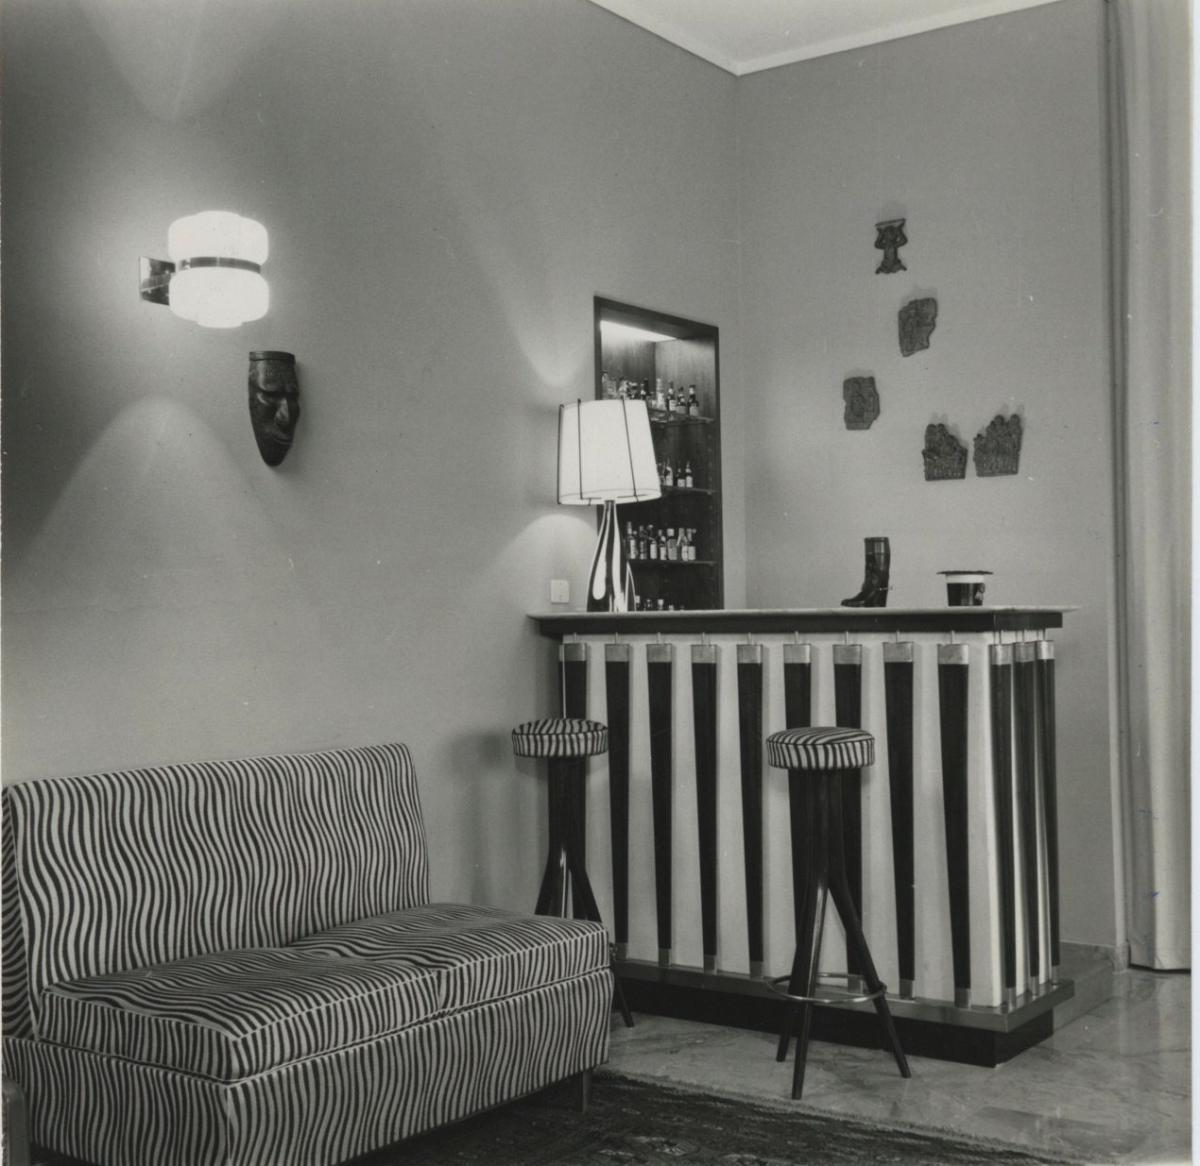 Italia interior design mobili by photographie originale for Mobili design italia